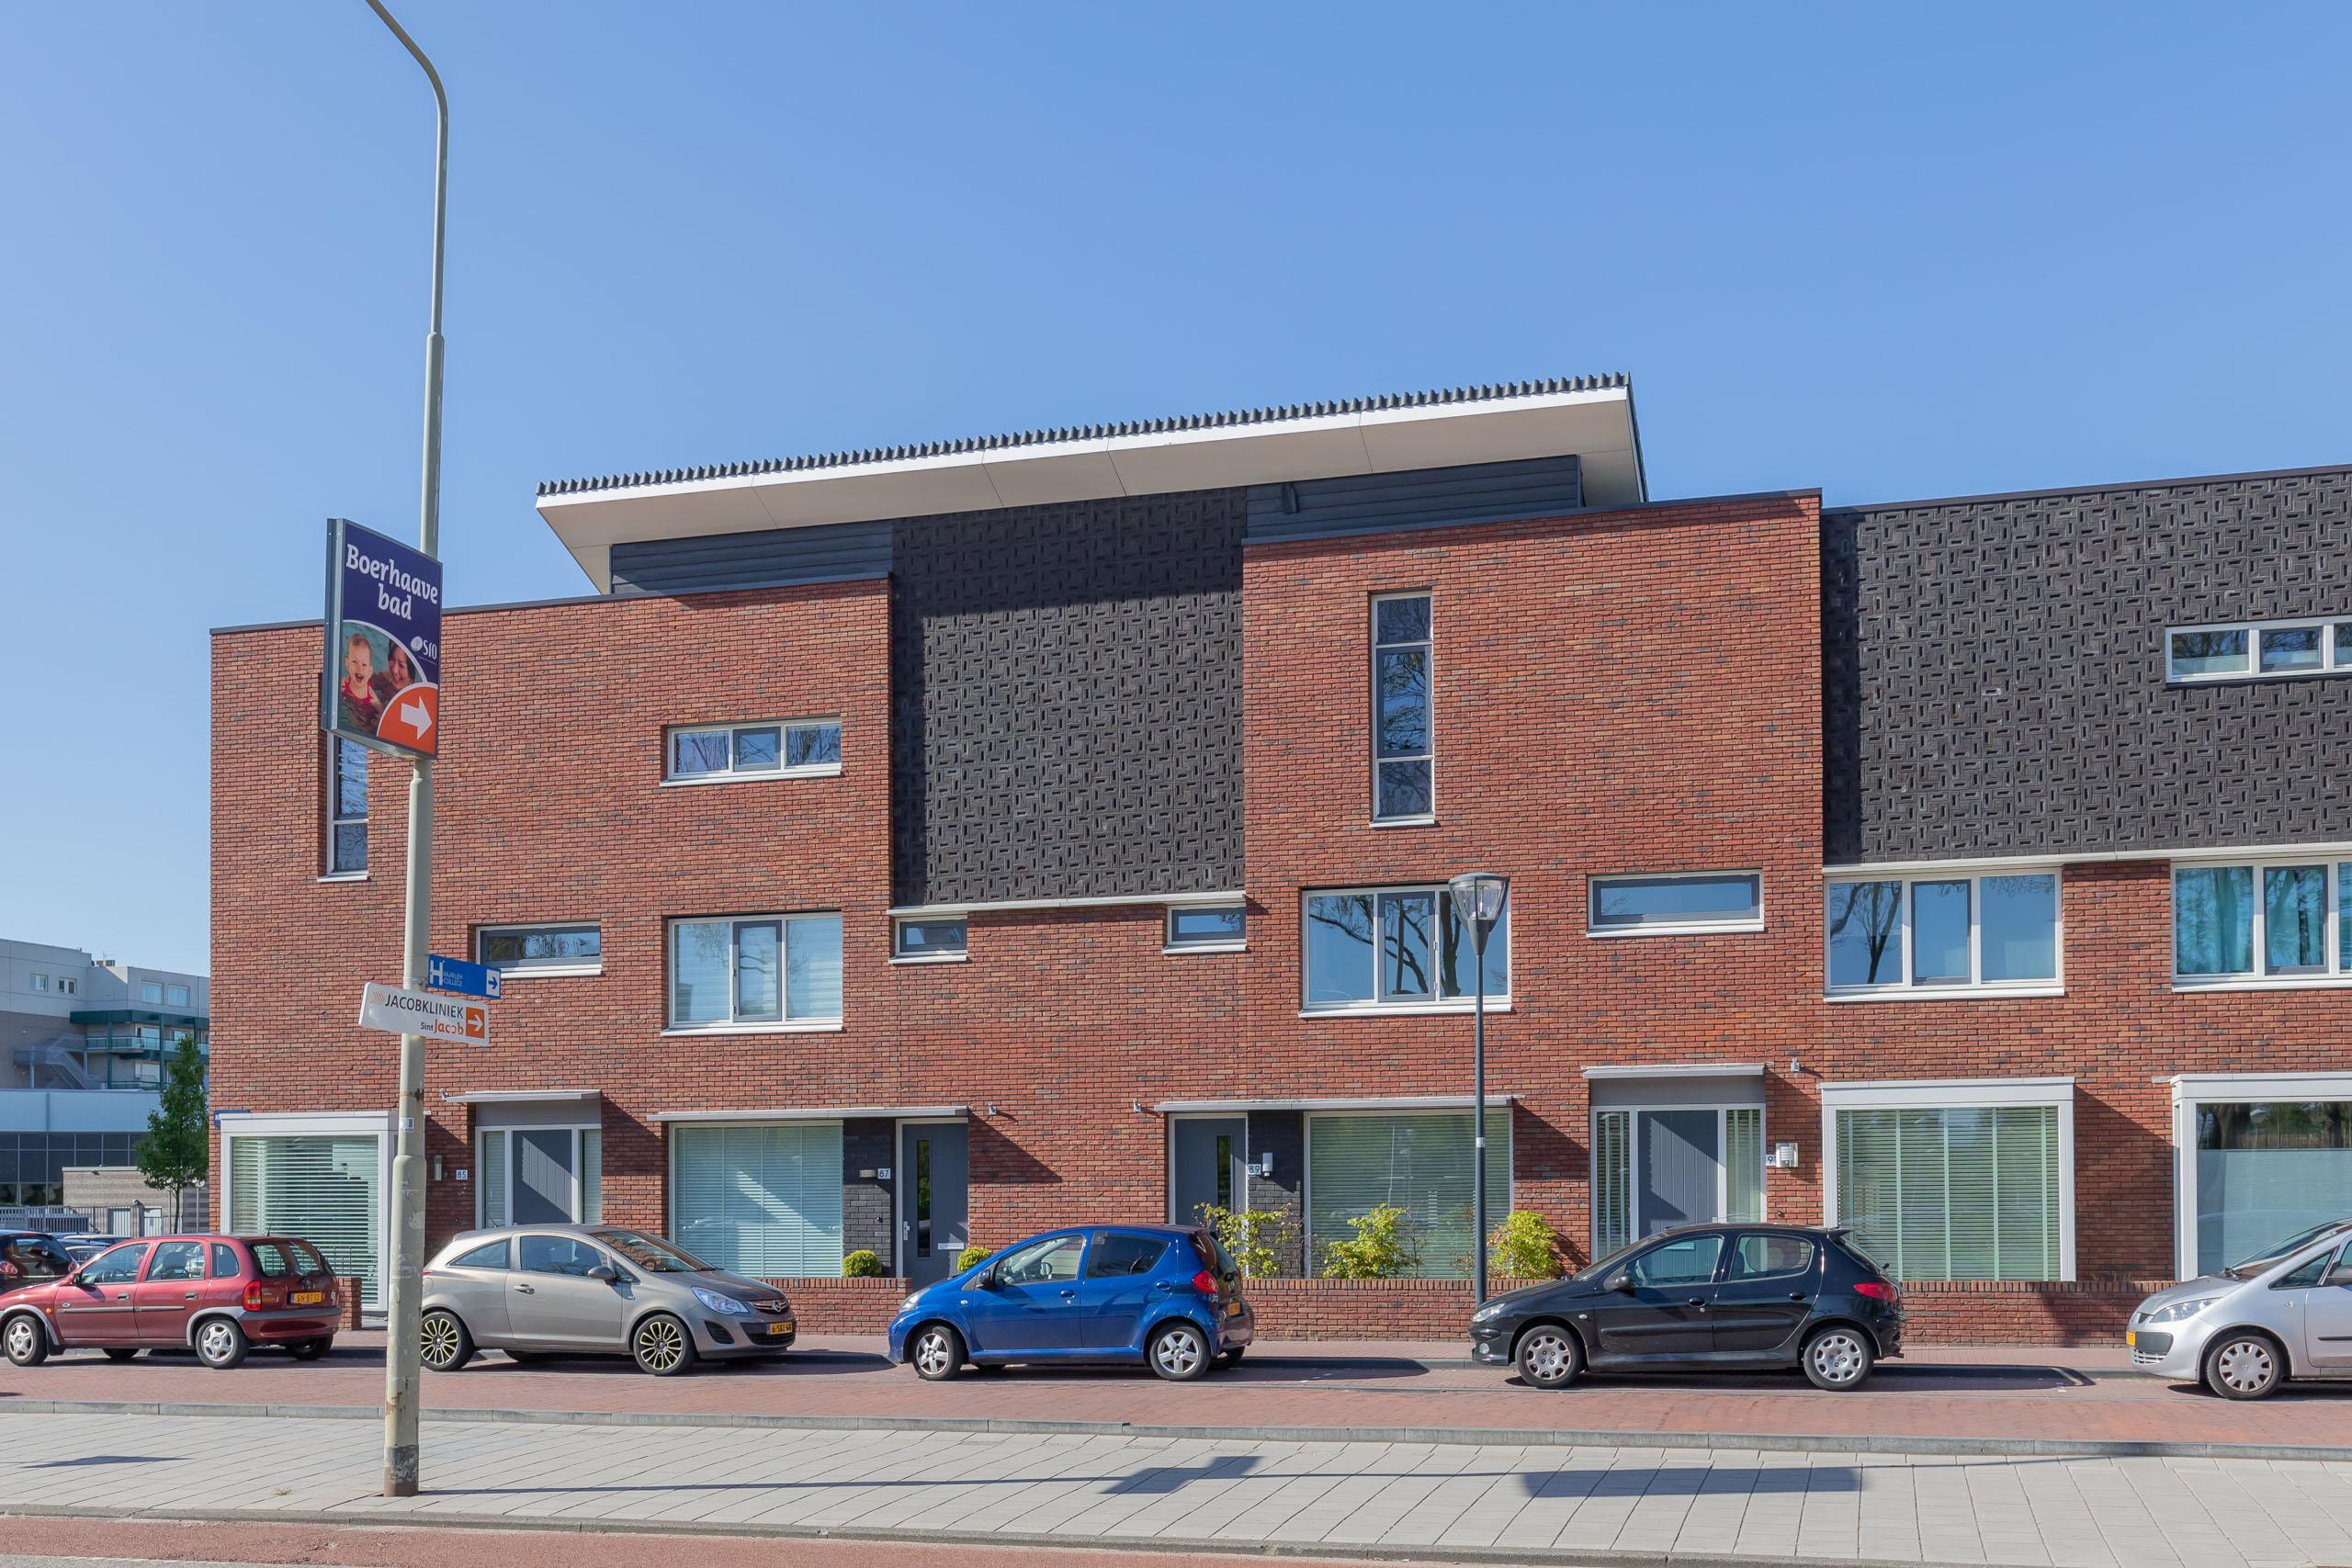 Roolandweg, Haarlem